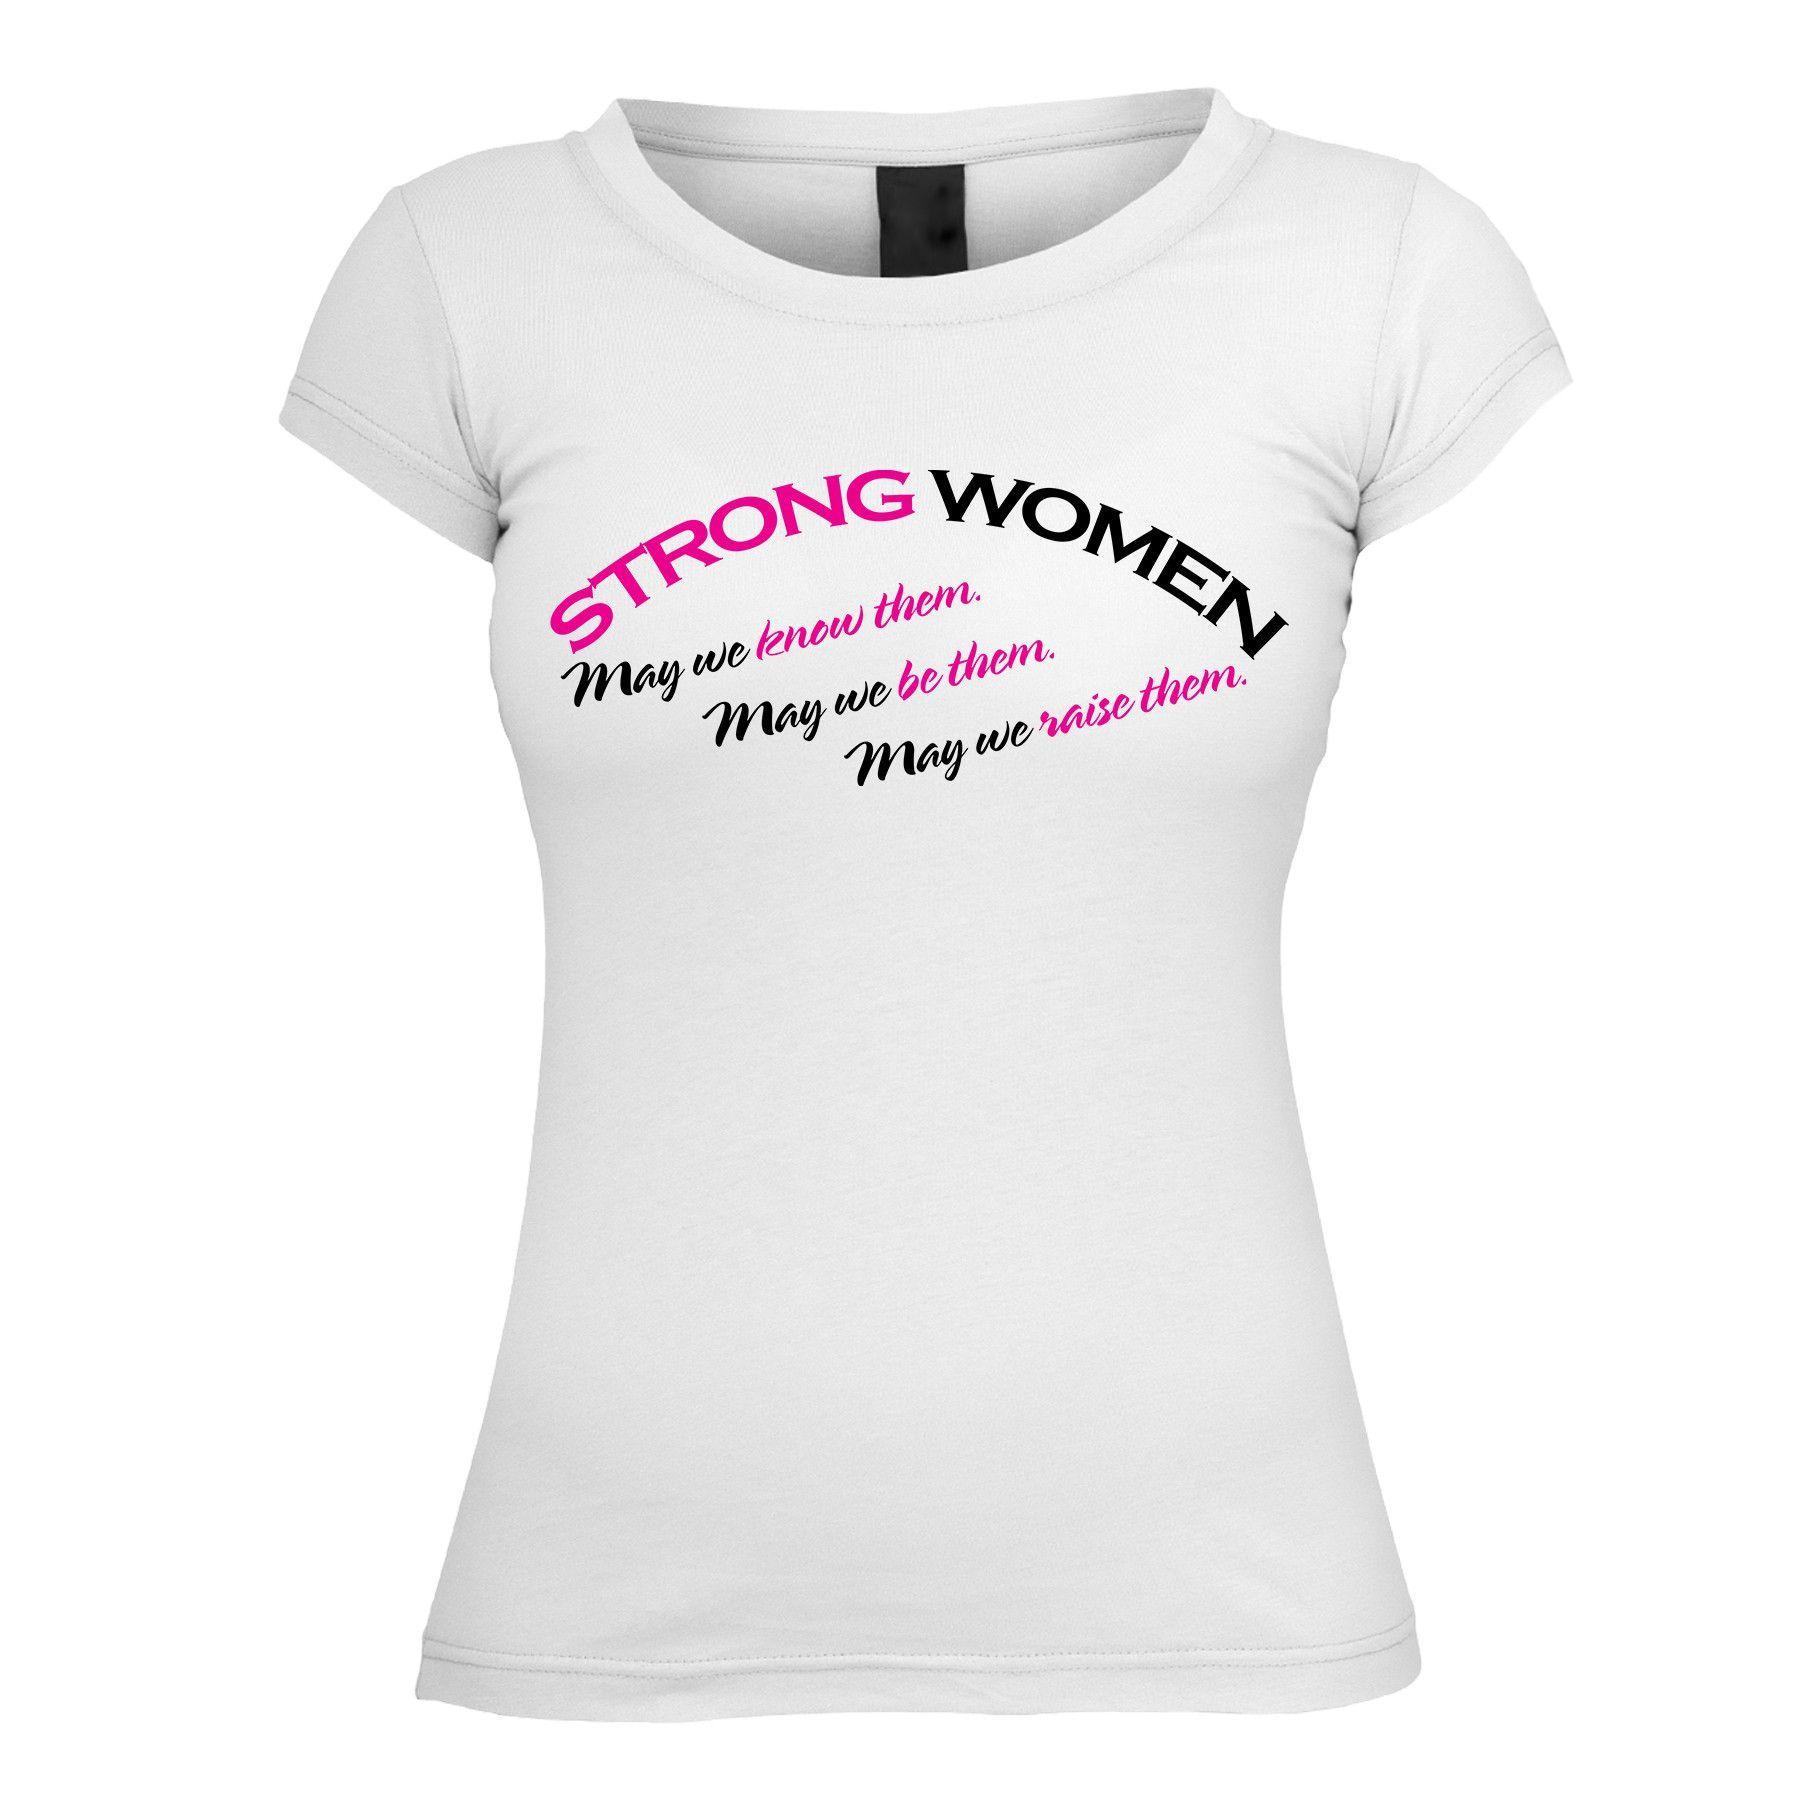 Strong Women Short Sleeve Tshirt